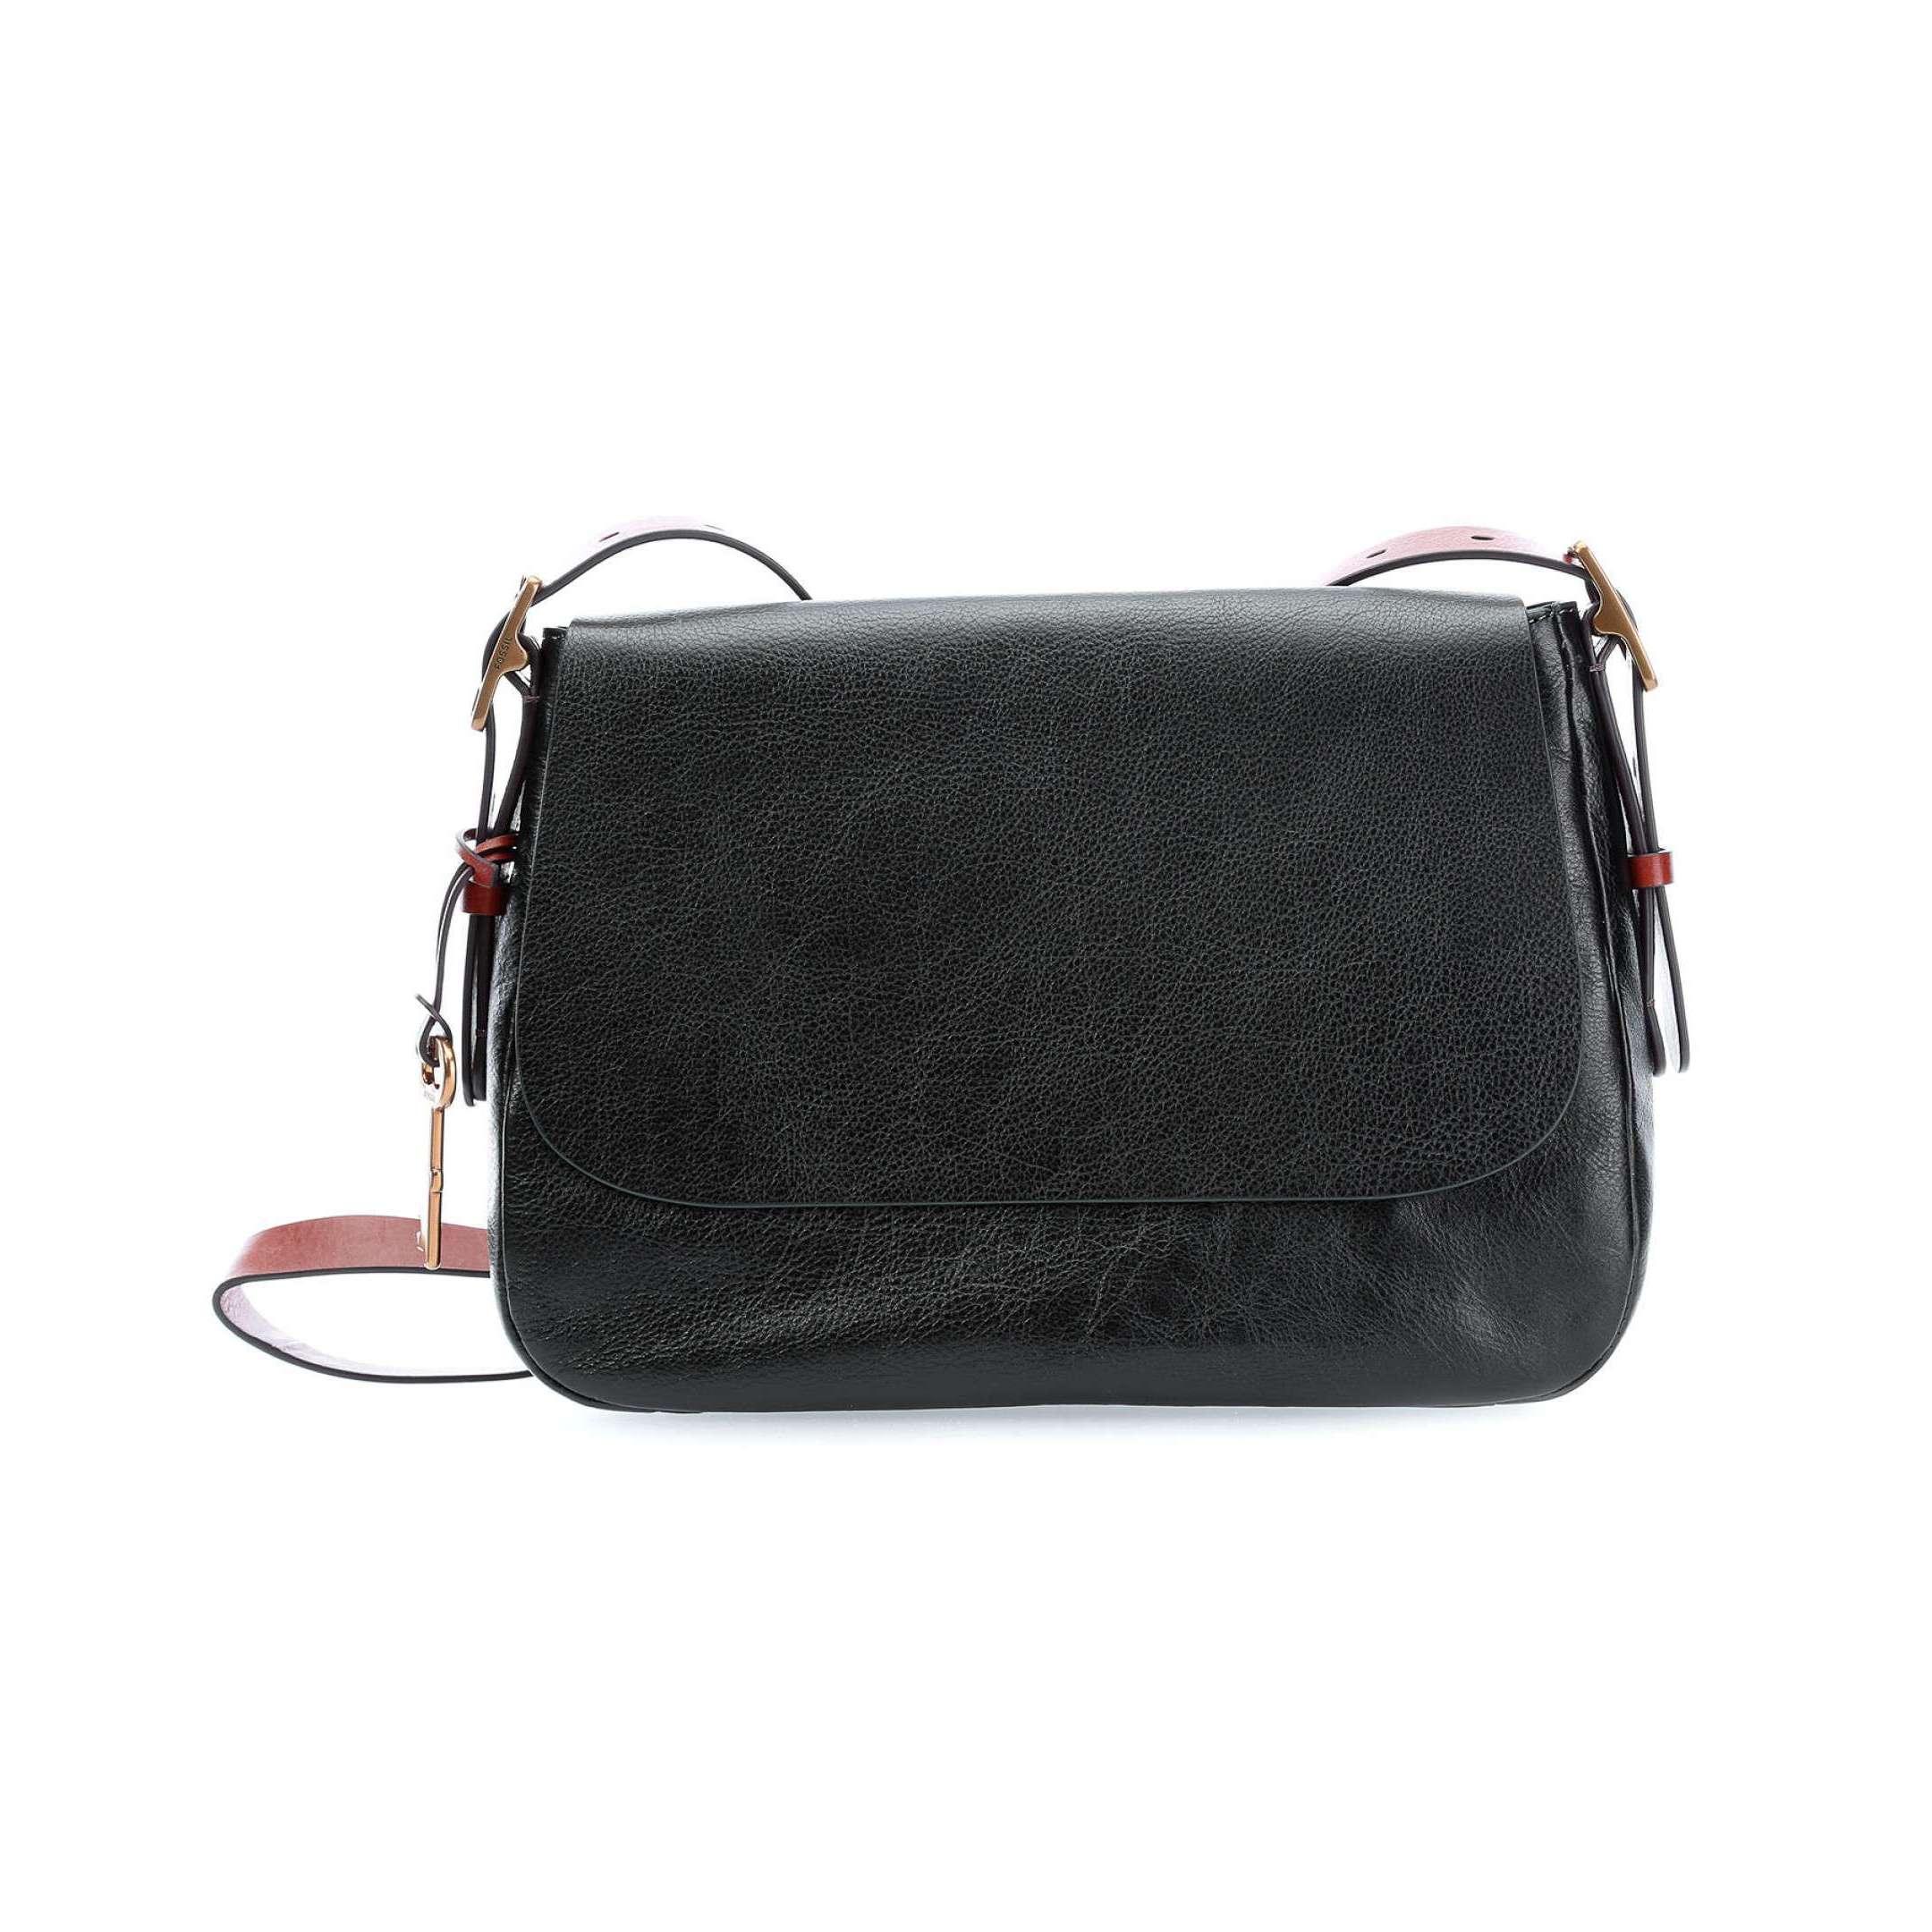 Mossi Fossil Harper Black Leather Large Crossbody Handbag...